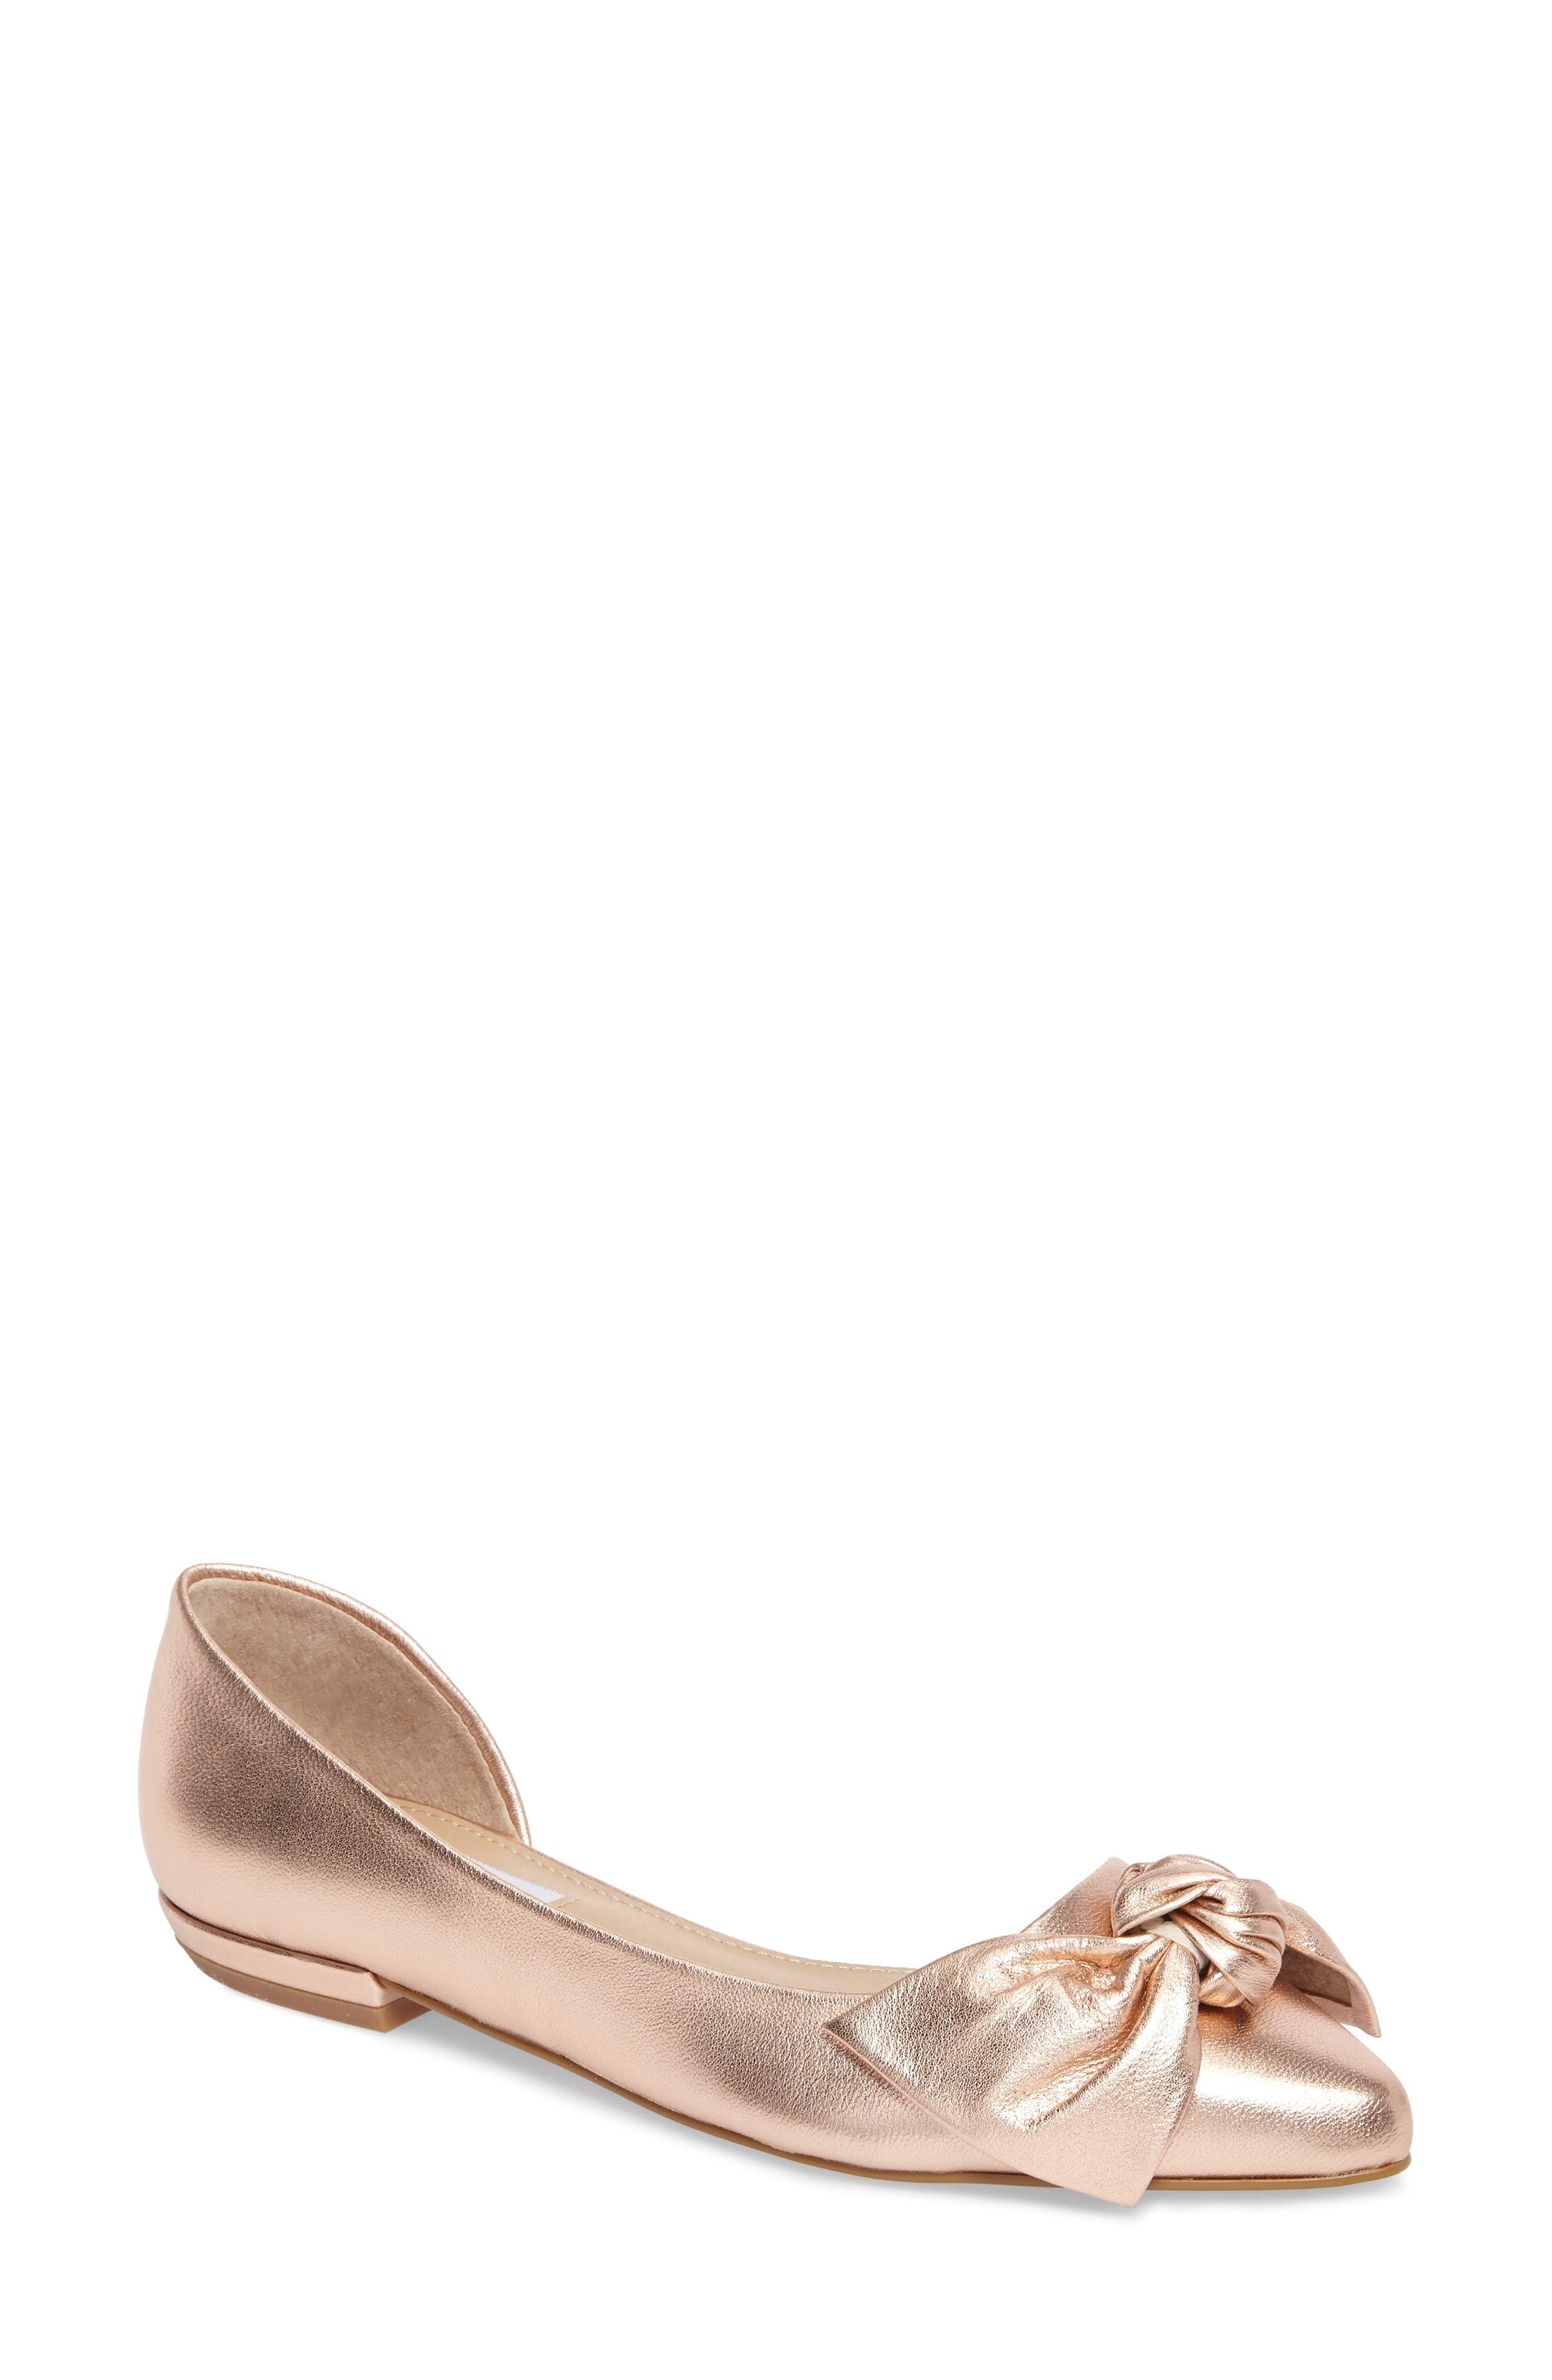 Edina d'Orsay Bow Flat,                             Main thumbnail 1, color,                             Rose Gold Leather